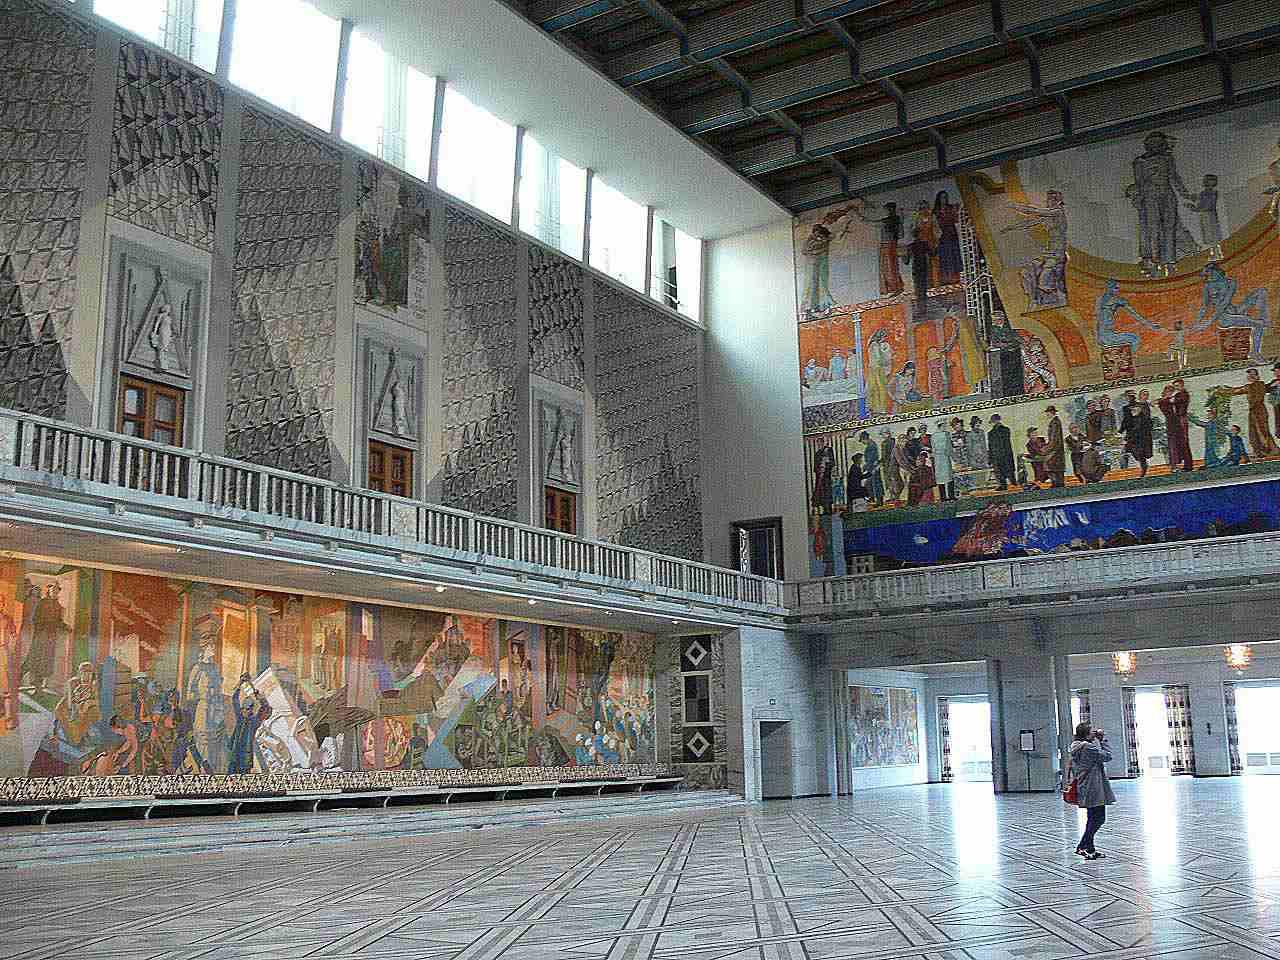 large hall, murals on walls, clerestory windows